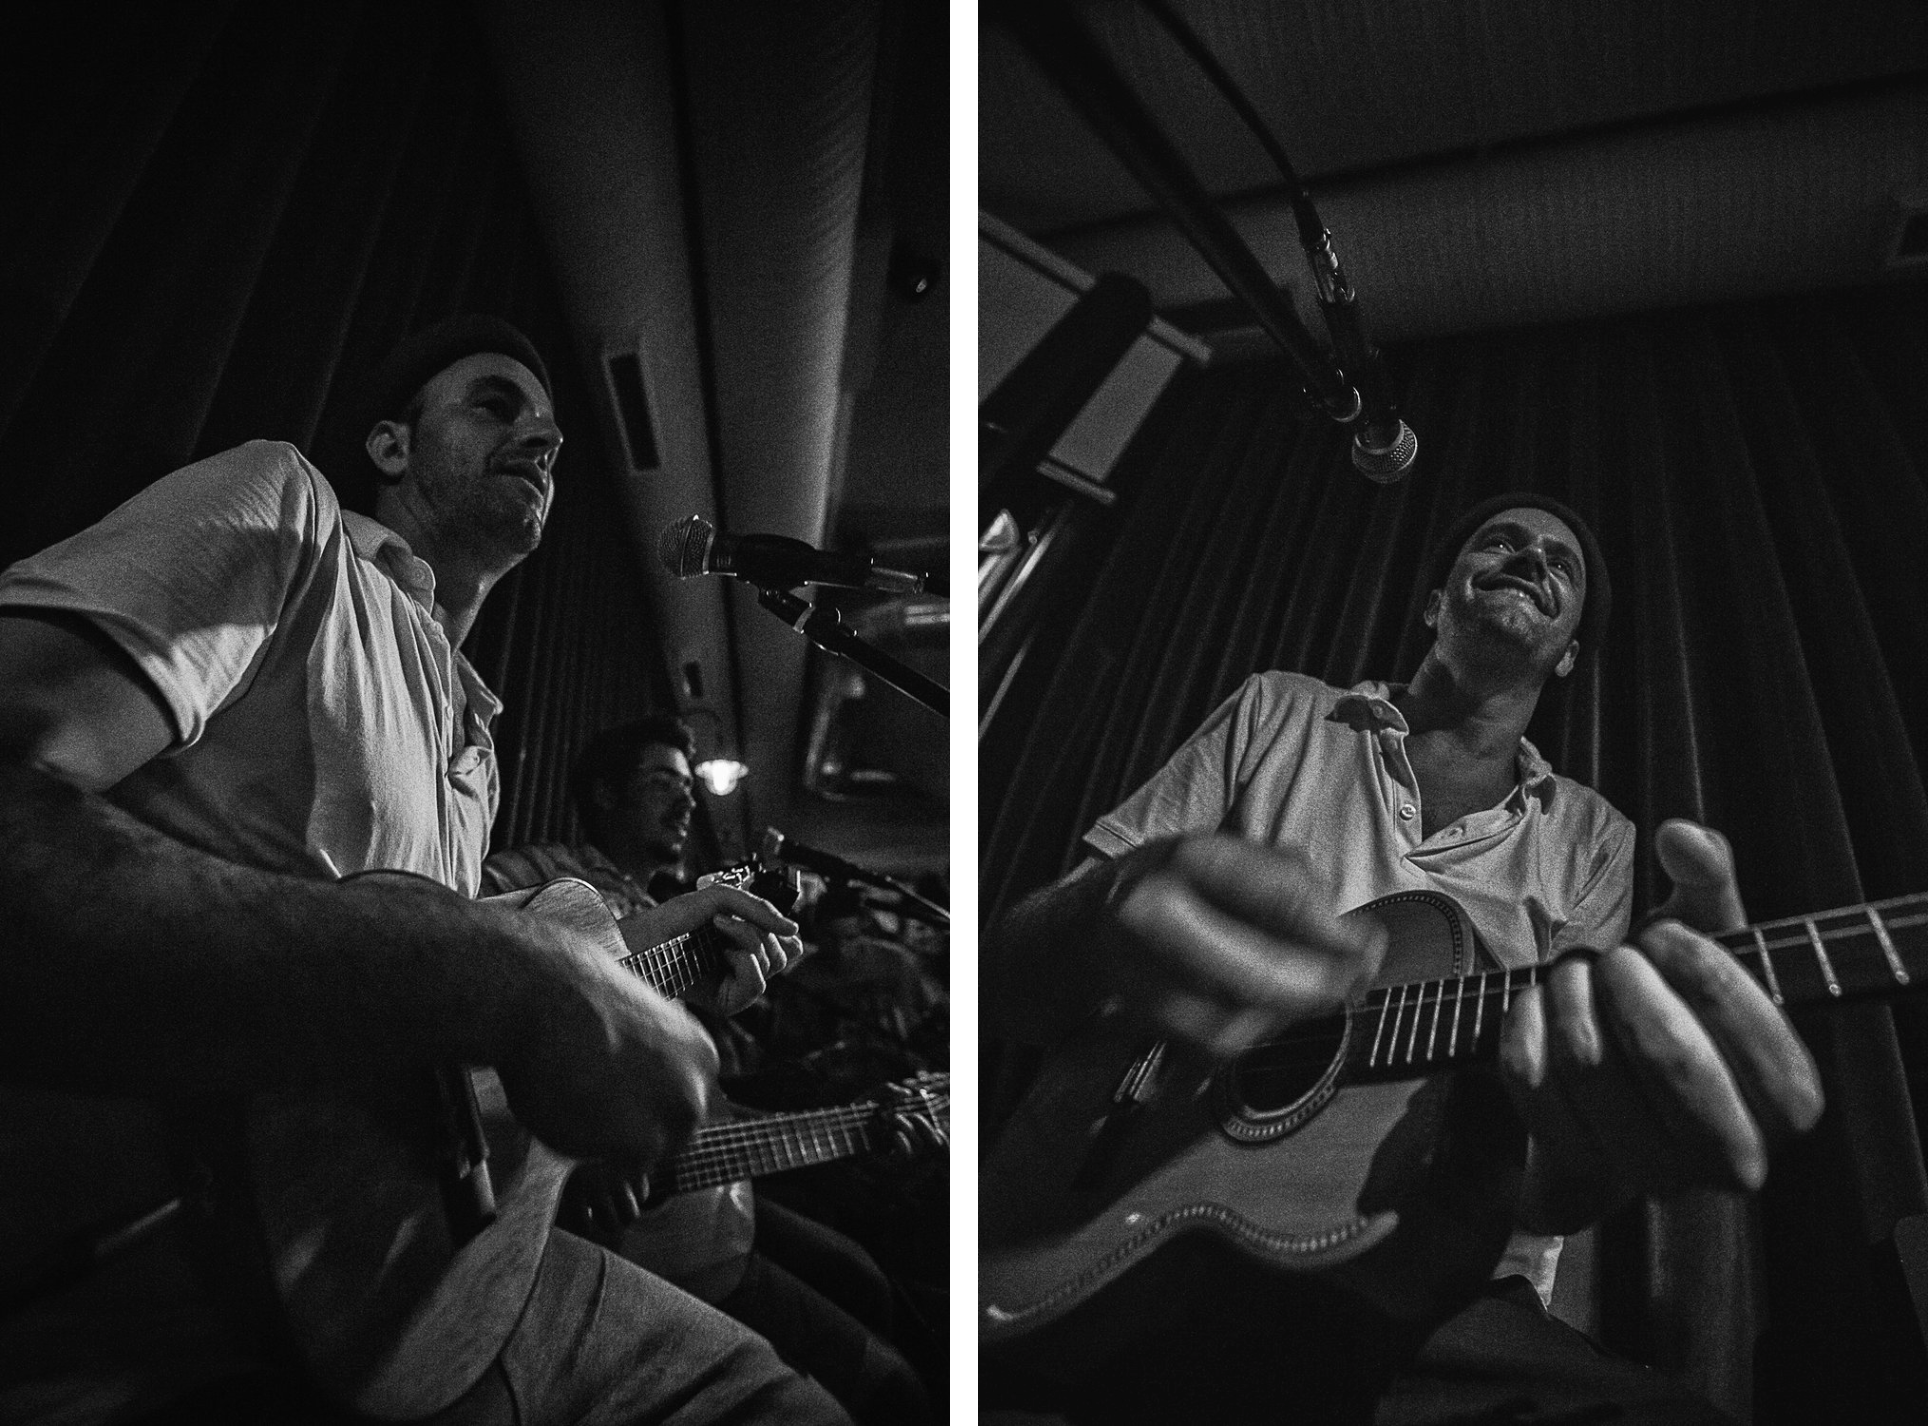 Quintal do Samba bonjourmolotov Andre Gigante Photography 01.png